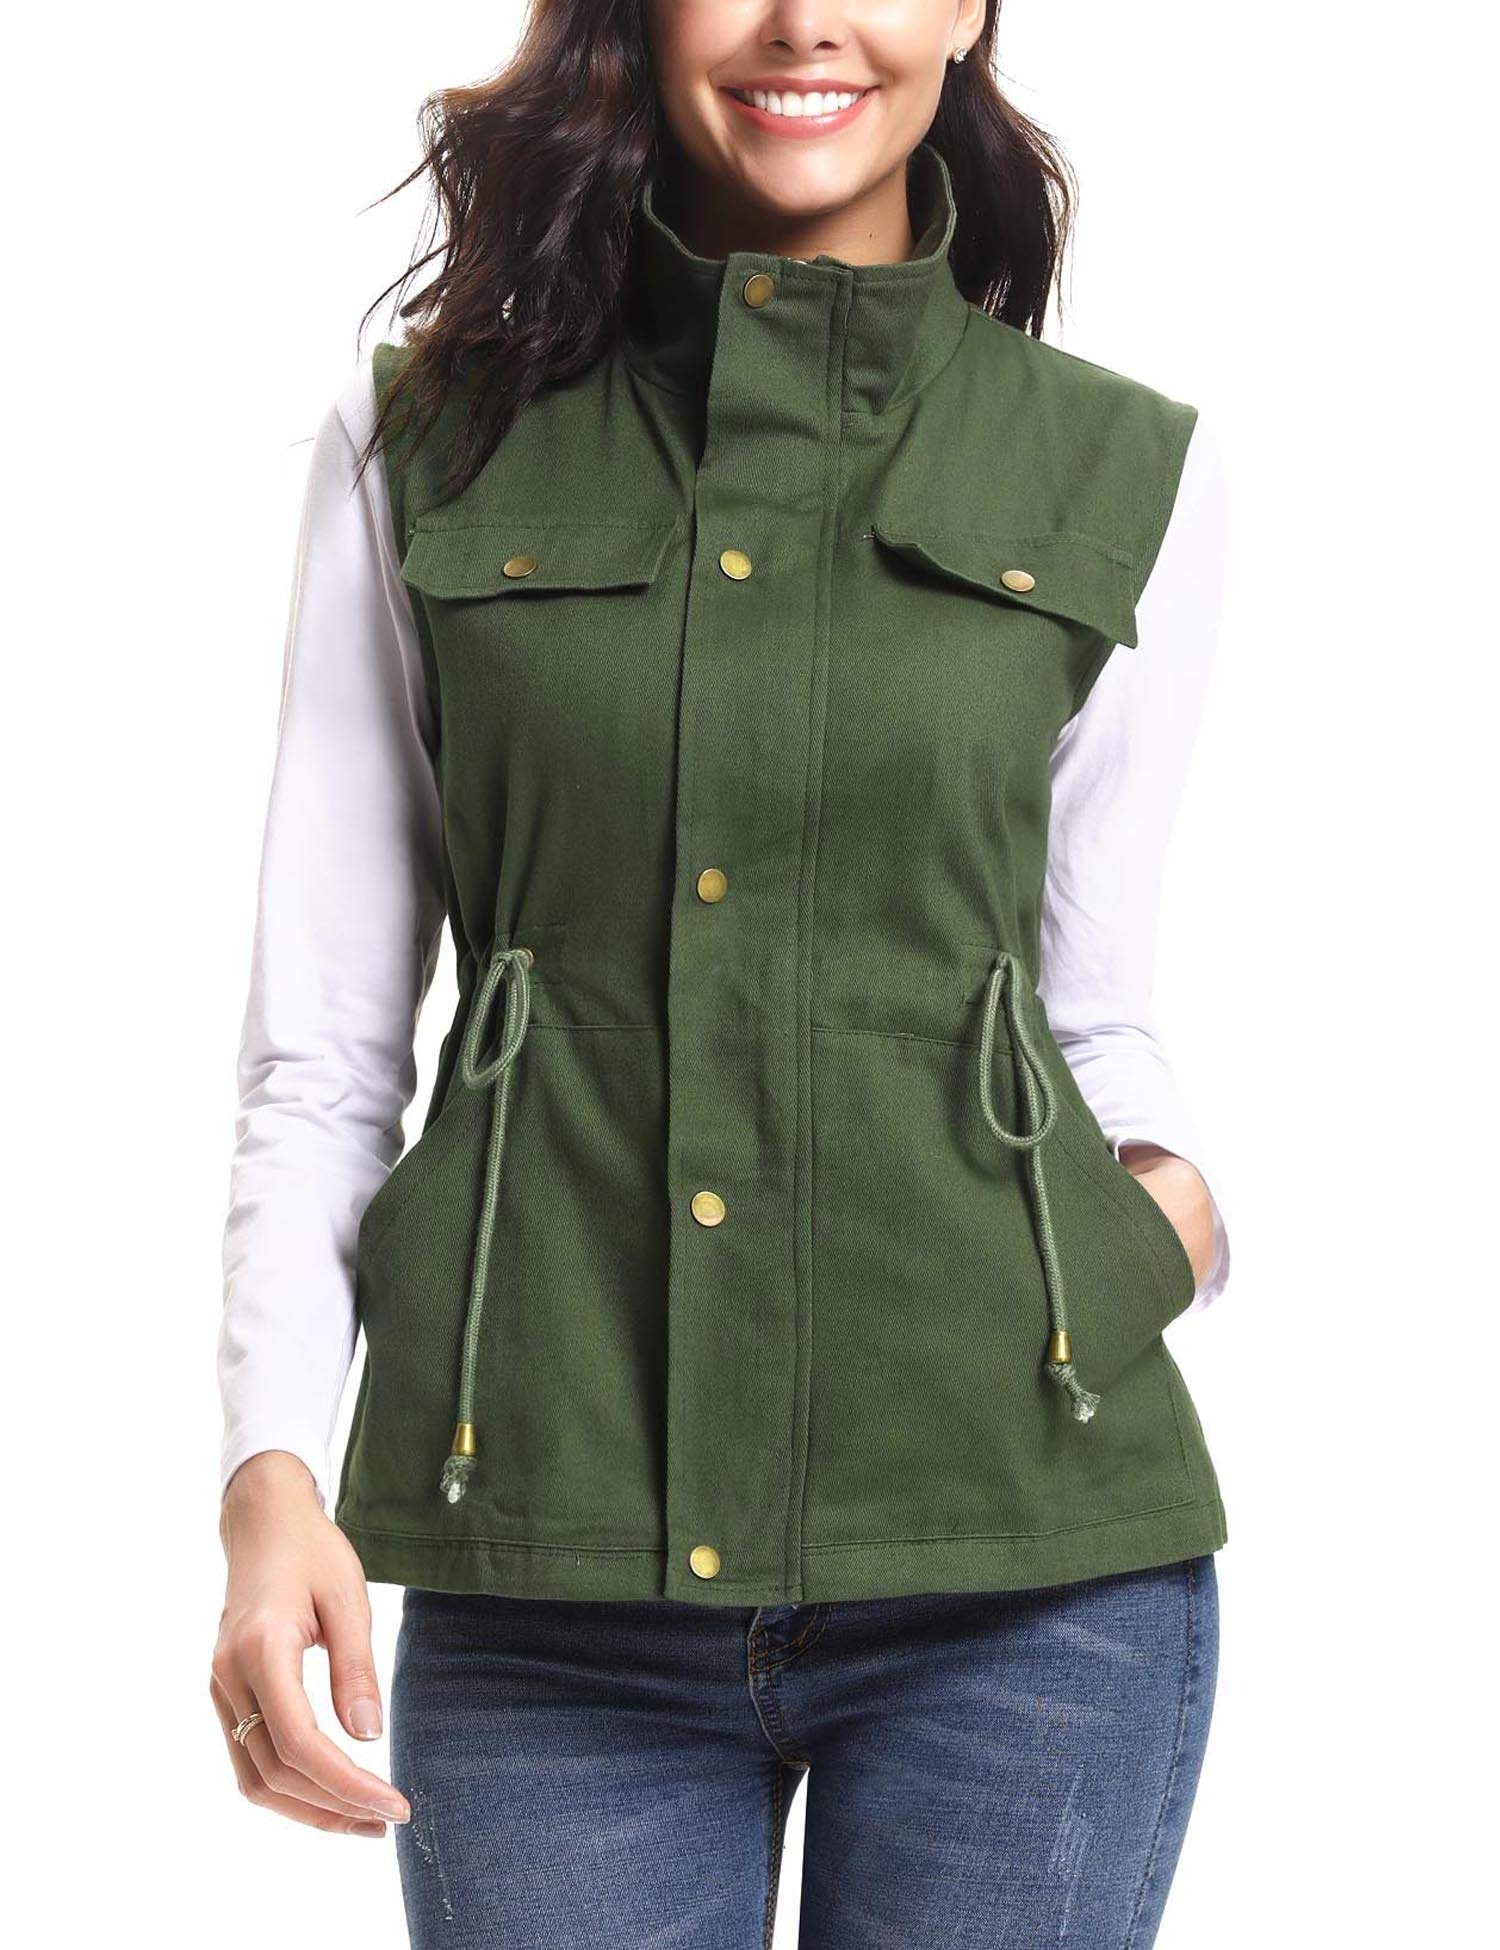 iClosam Women's Outerwear Vests Lightweight Anorak Military Utility Vest Jacket